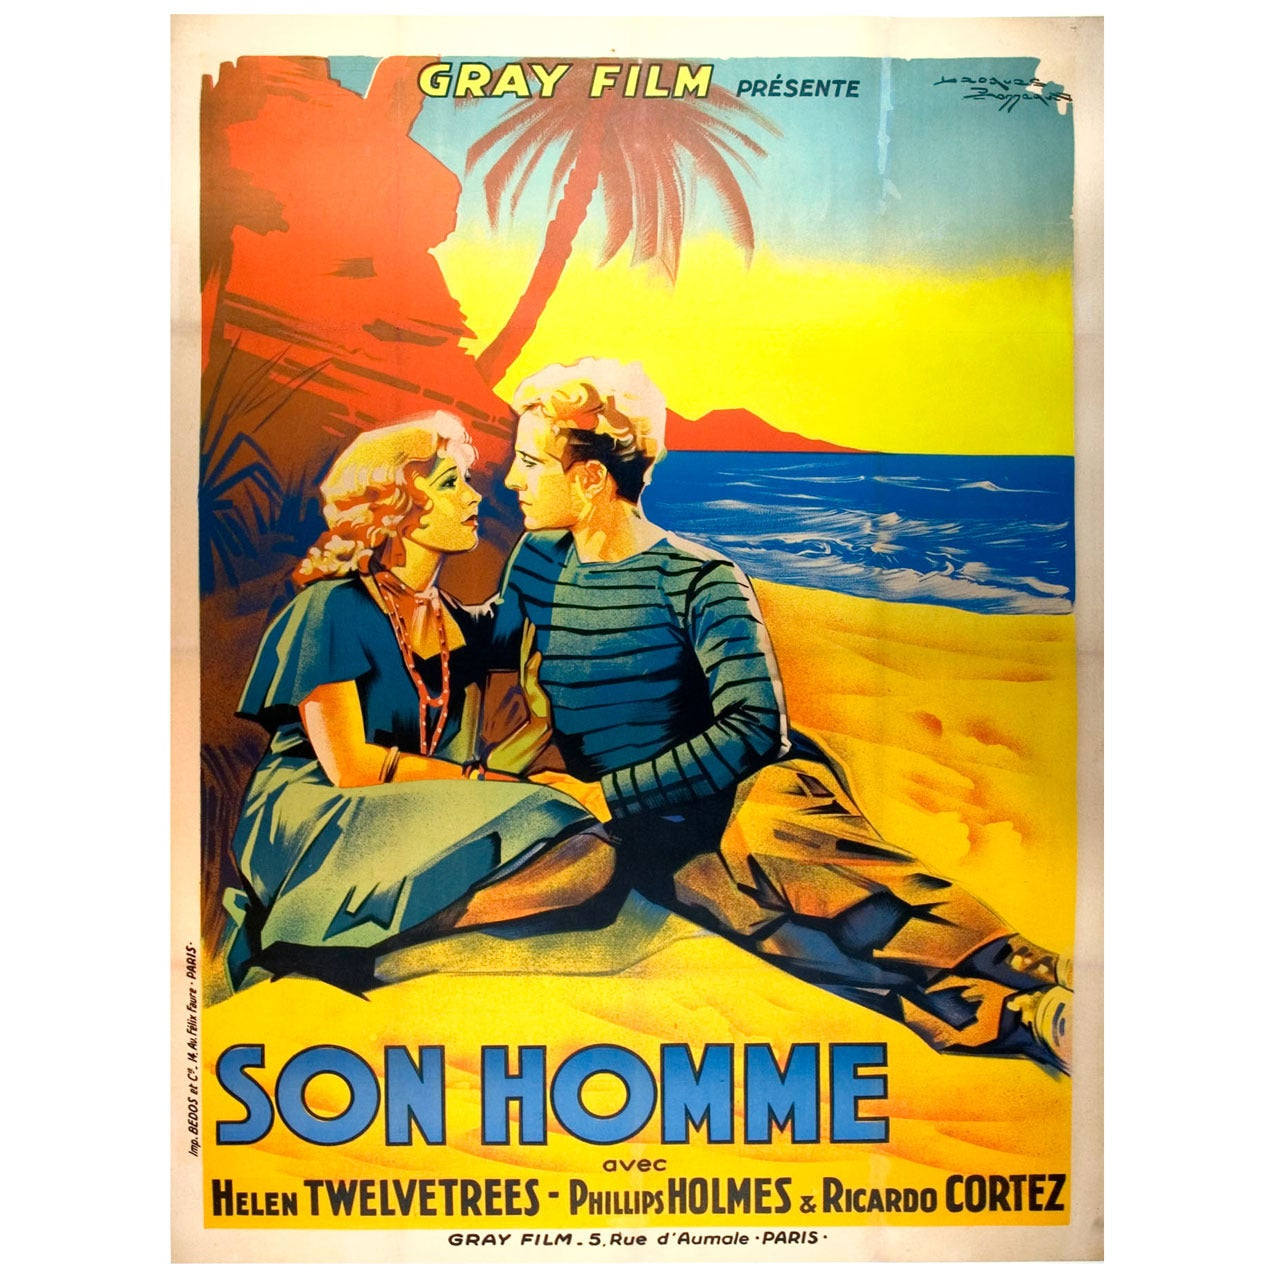 Original French Film Poster